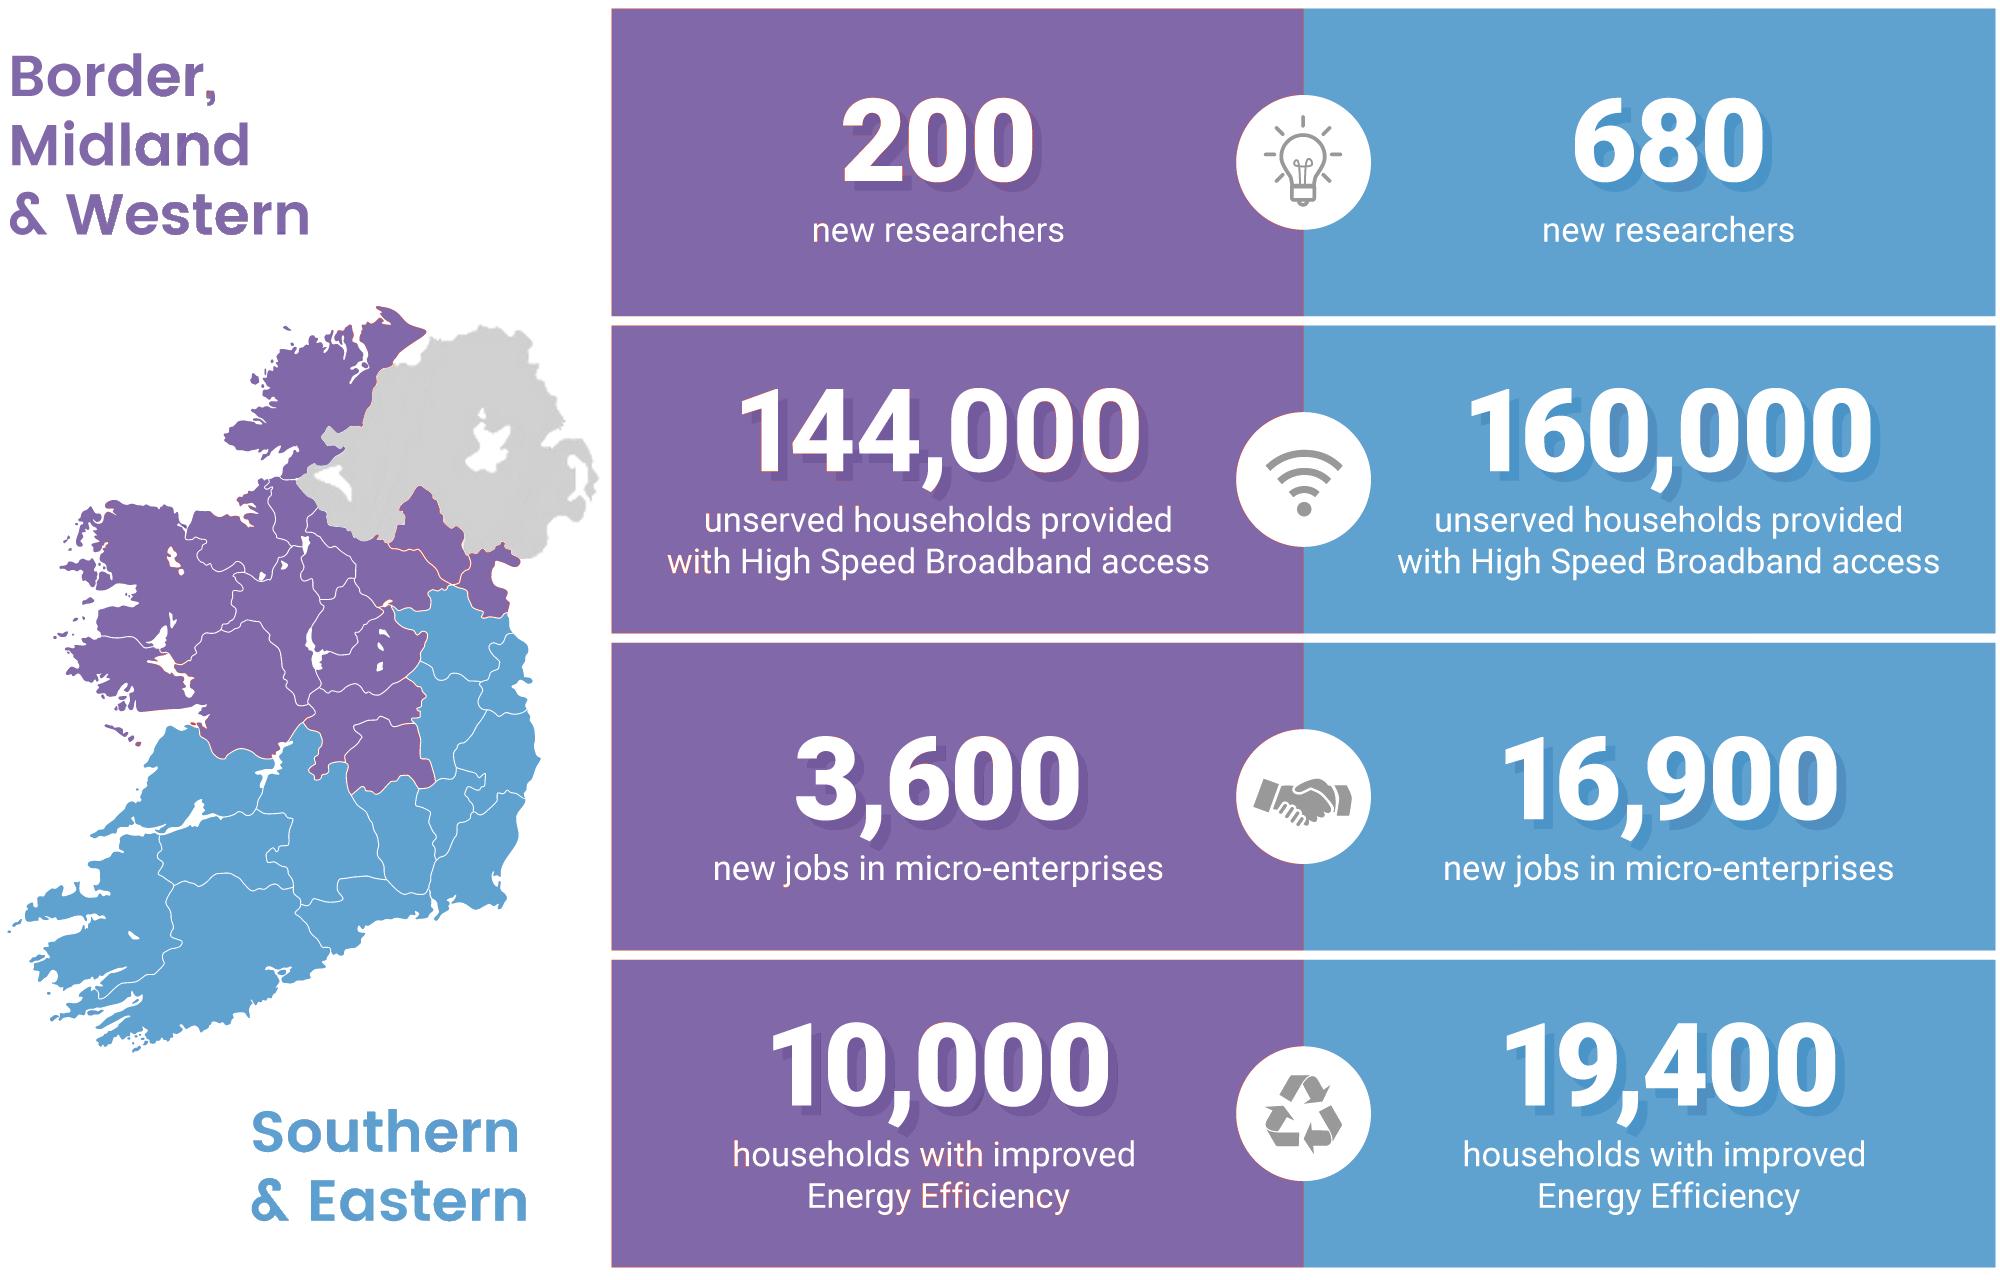 European Regional Development Fund national-map infographic